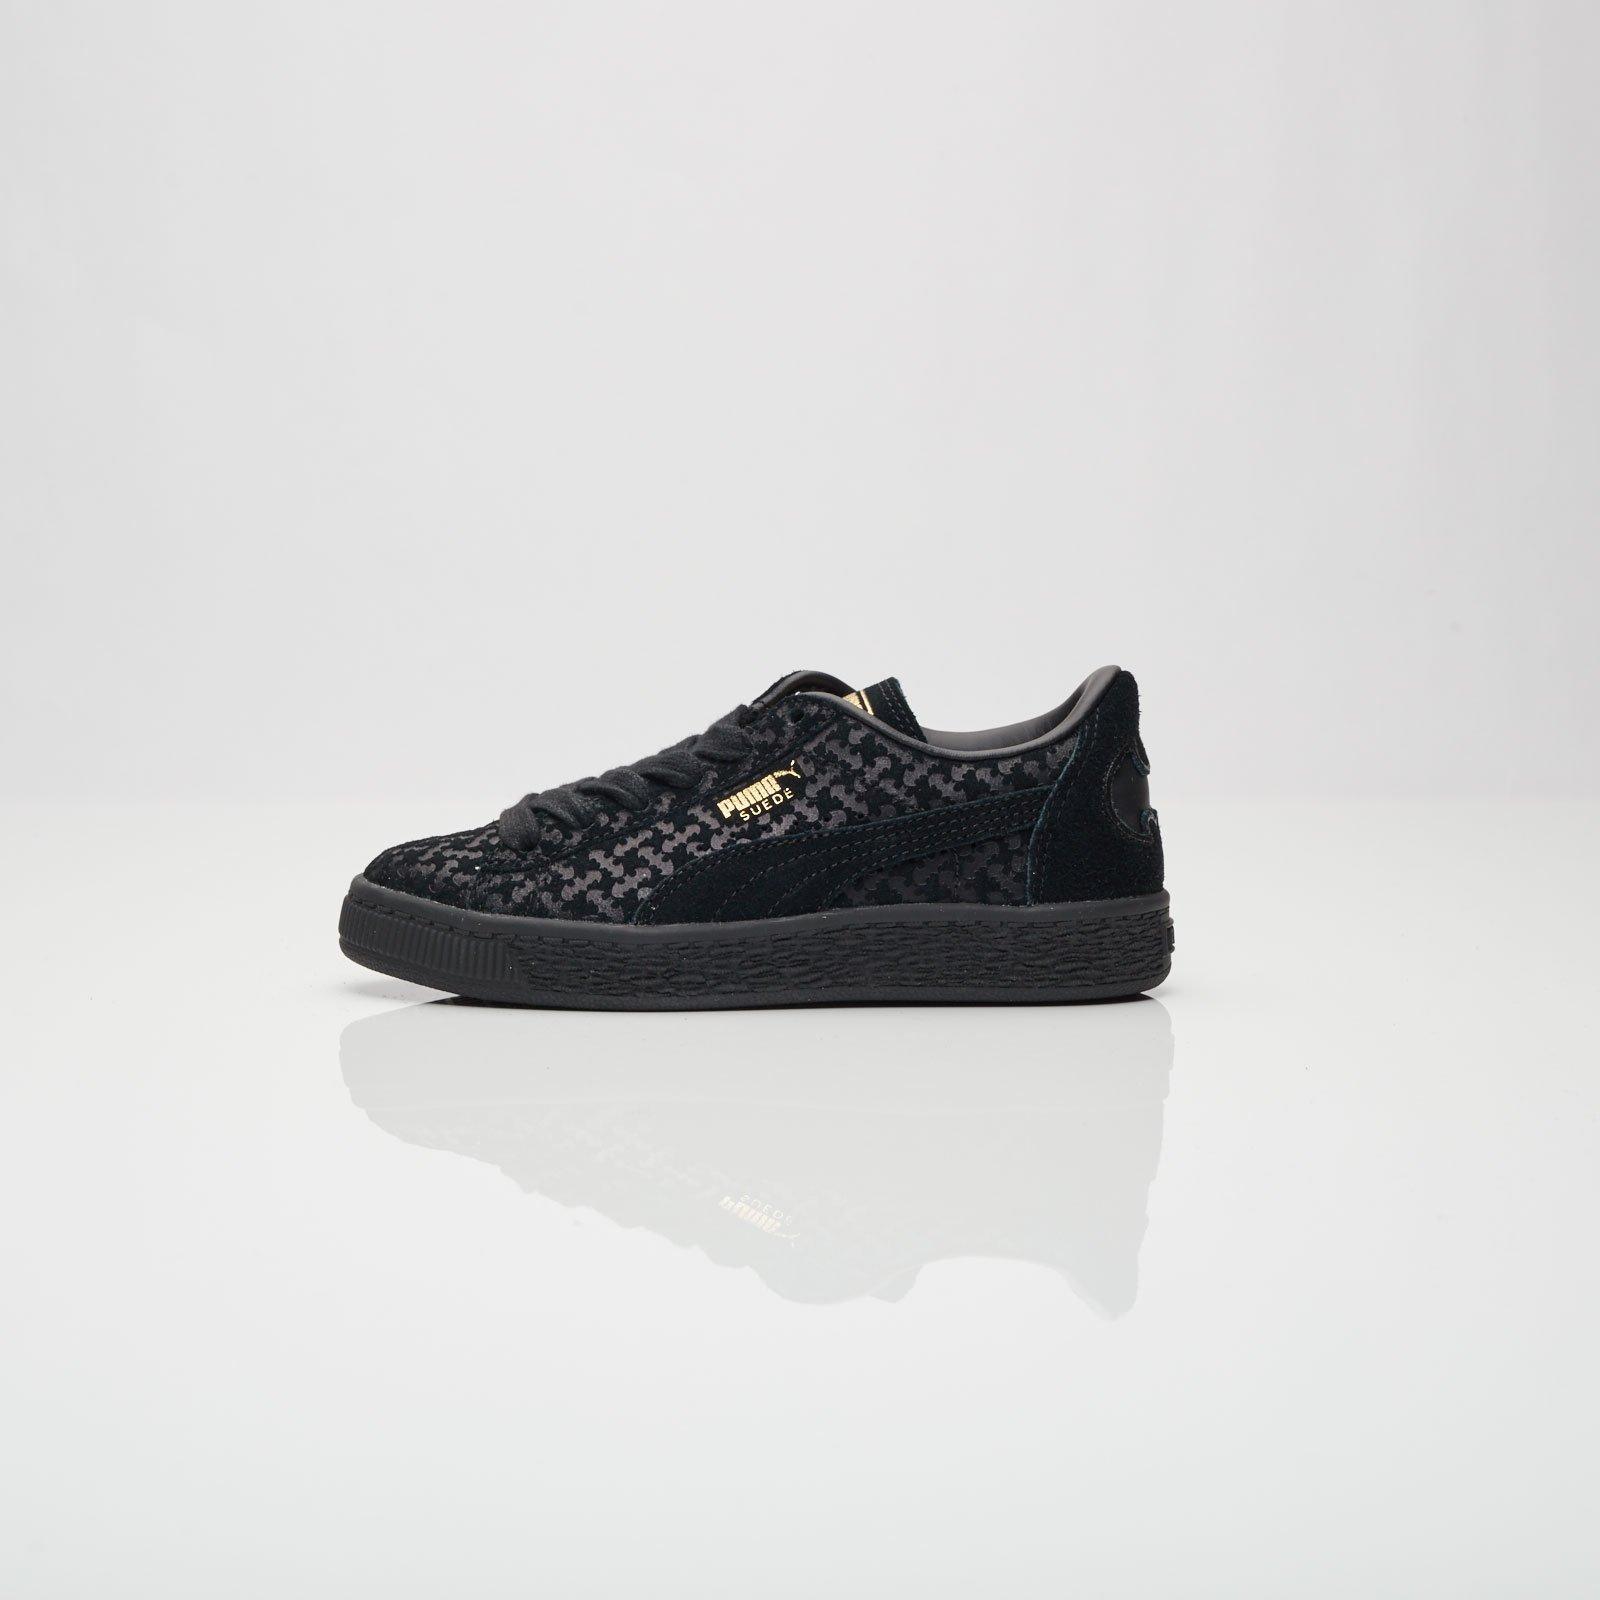 62396cee765e4c Puma Suede Batman Fm Ps - 362494-01 - Sneakersnstuff